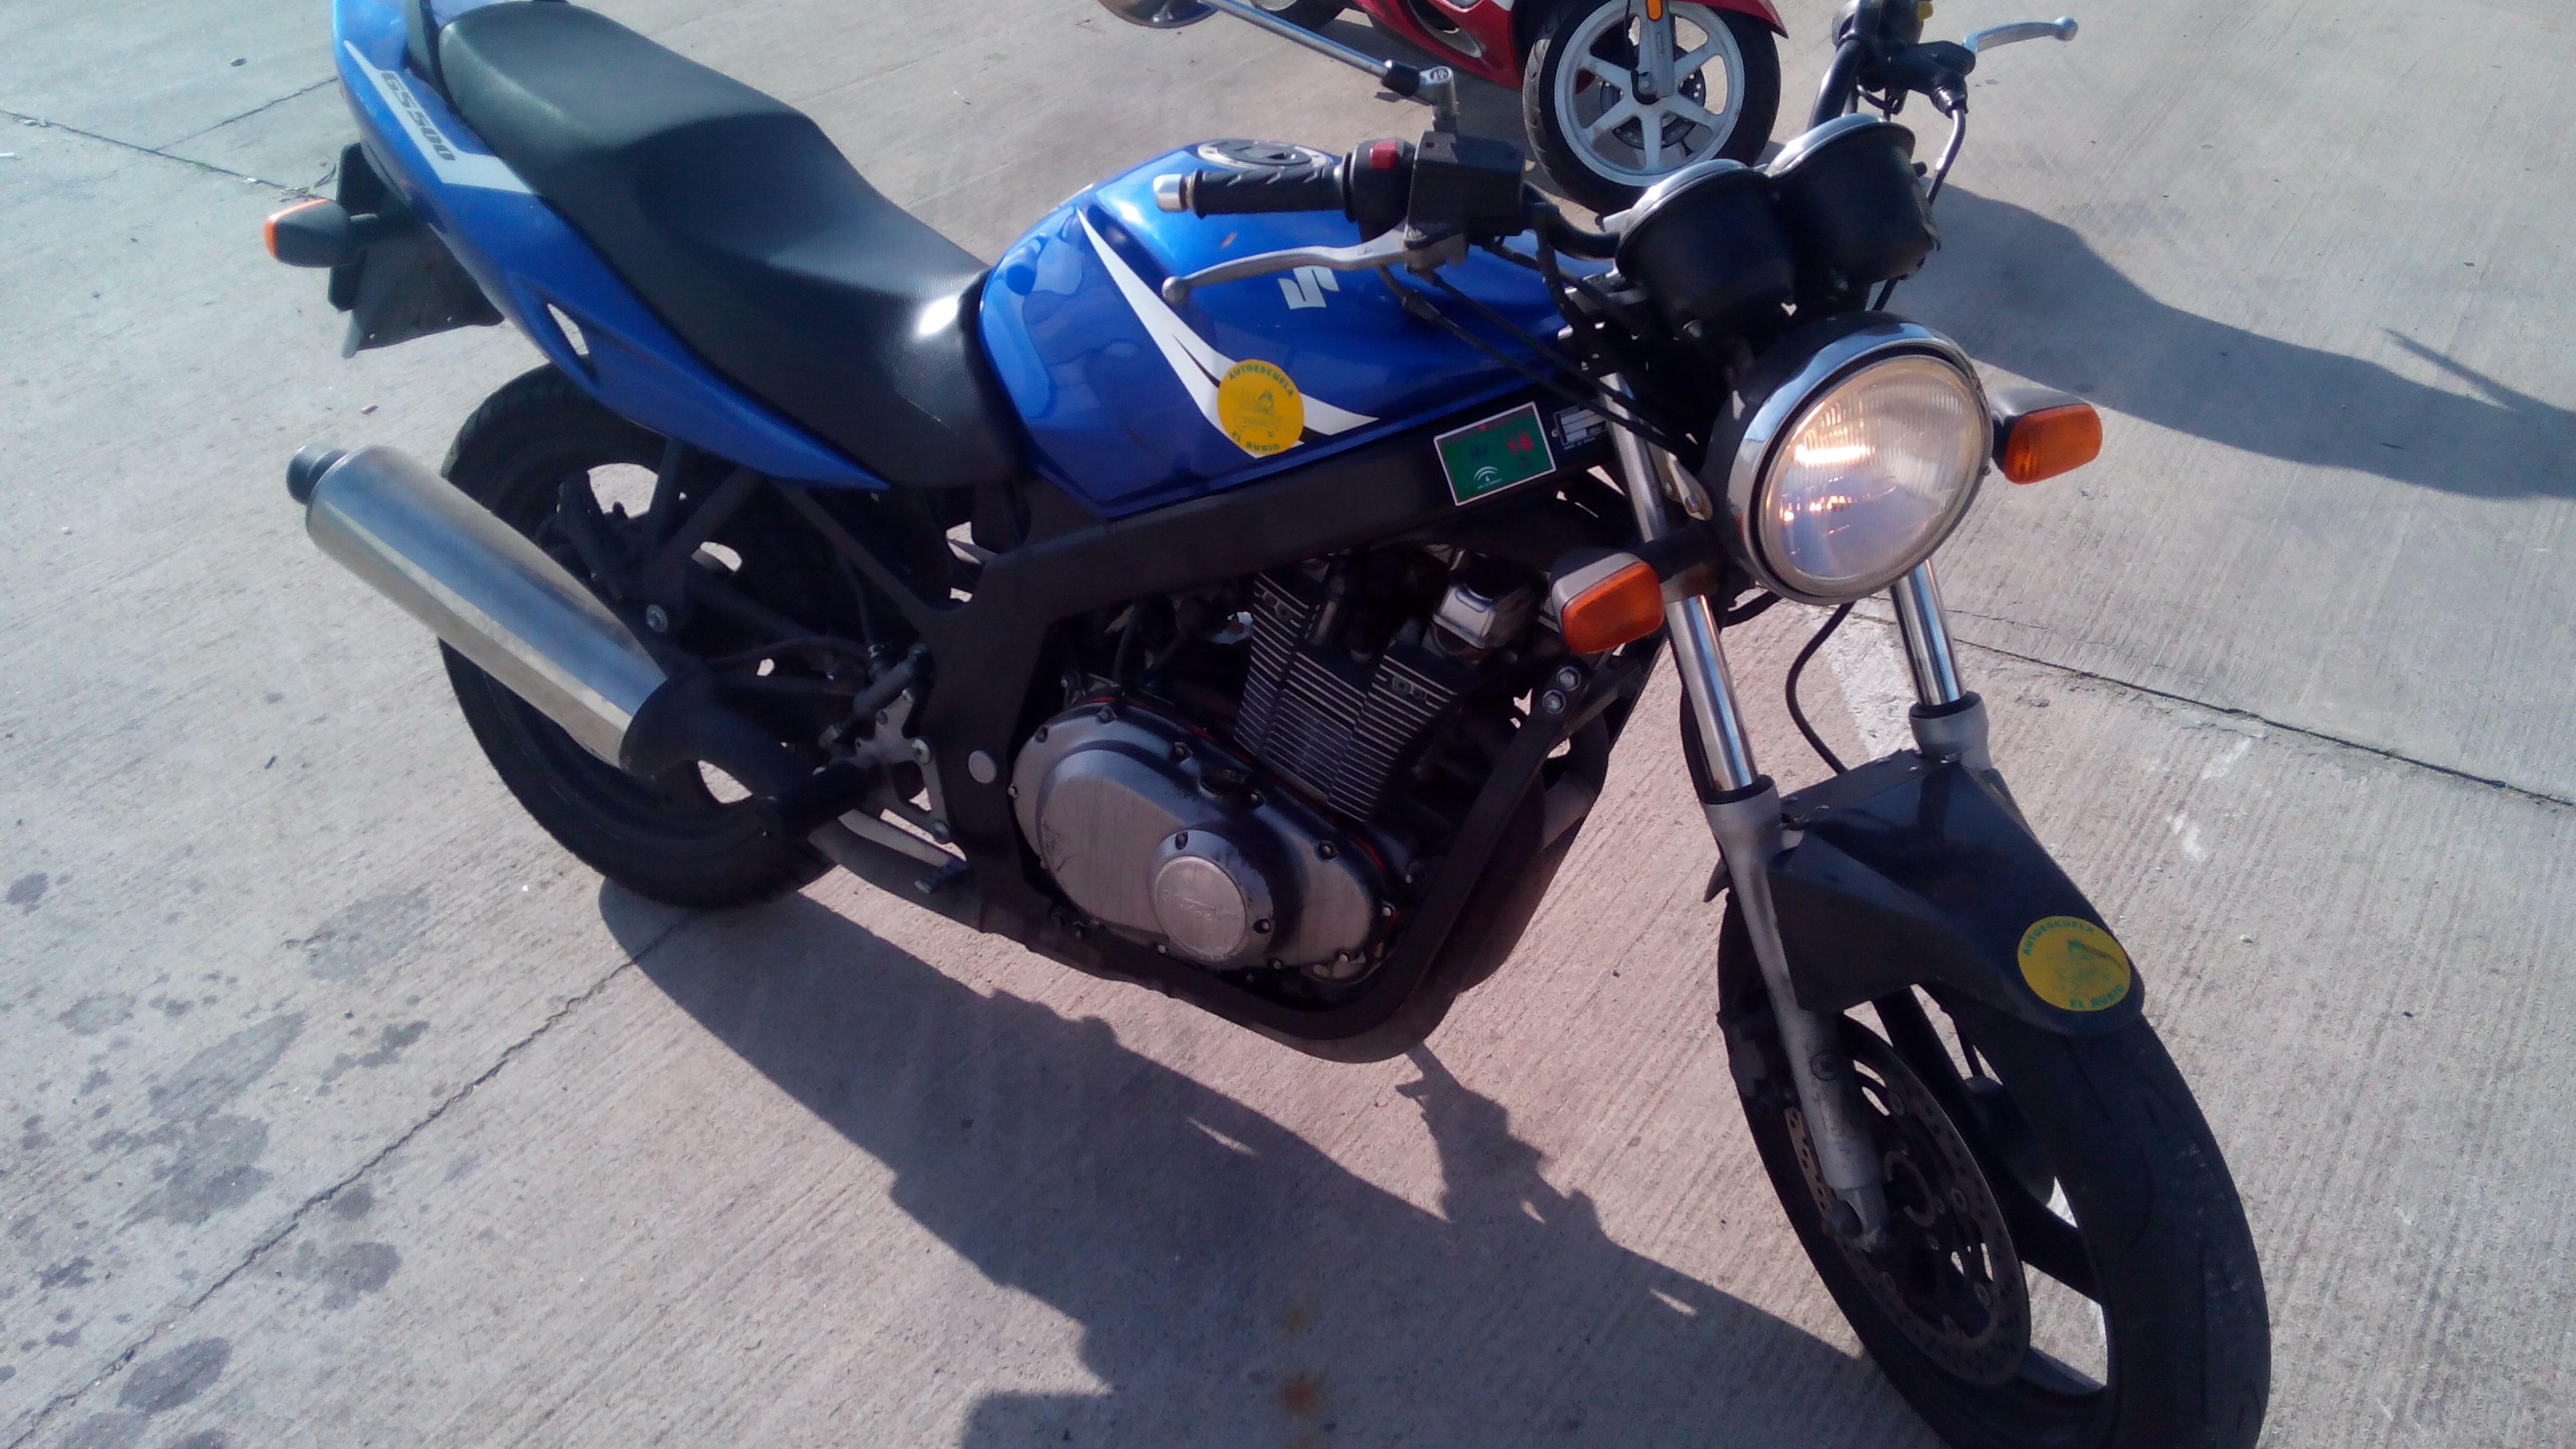 Motocicleta para el permiso de conducir A2